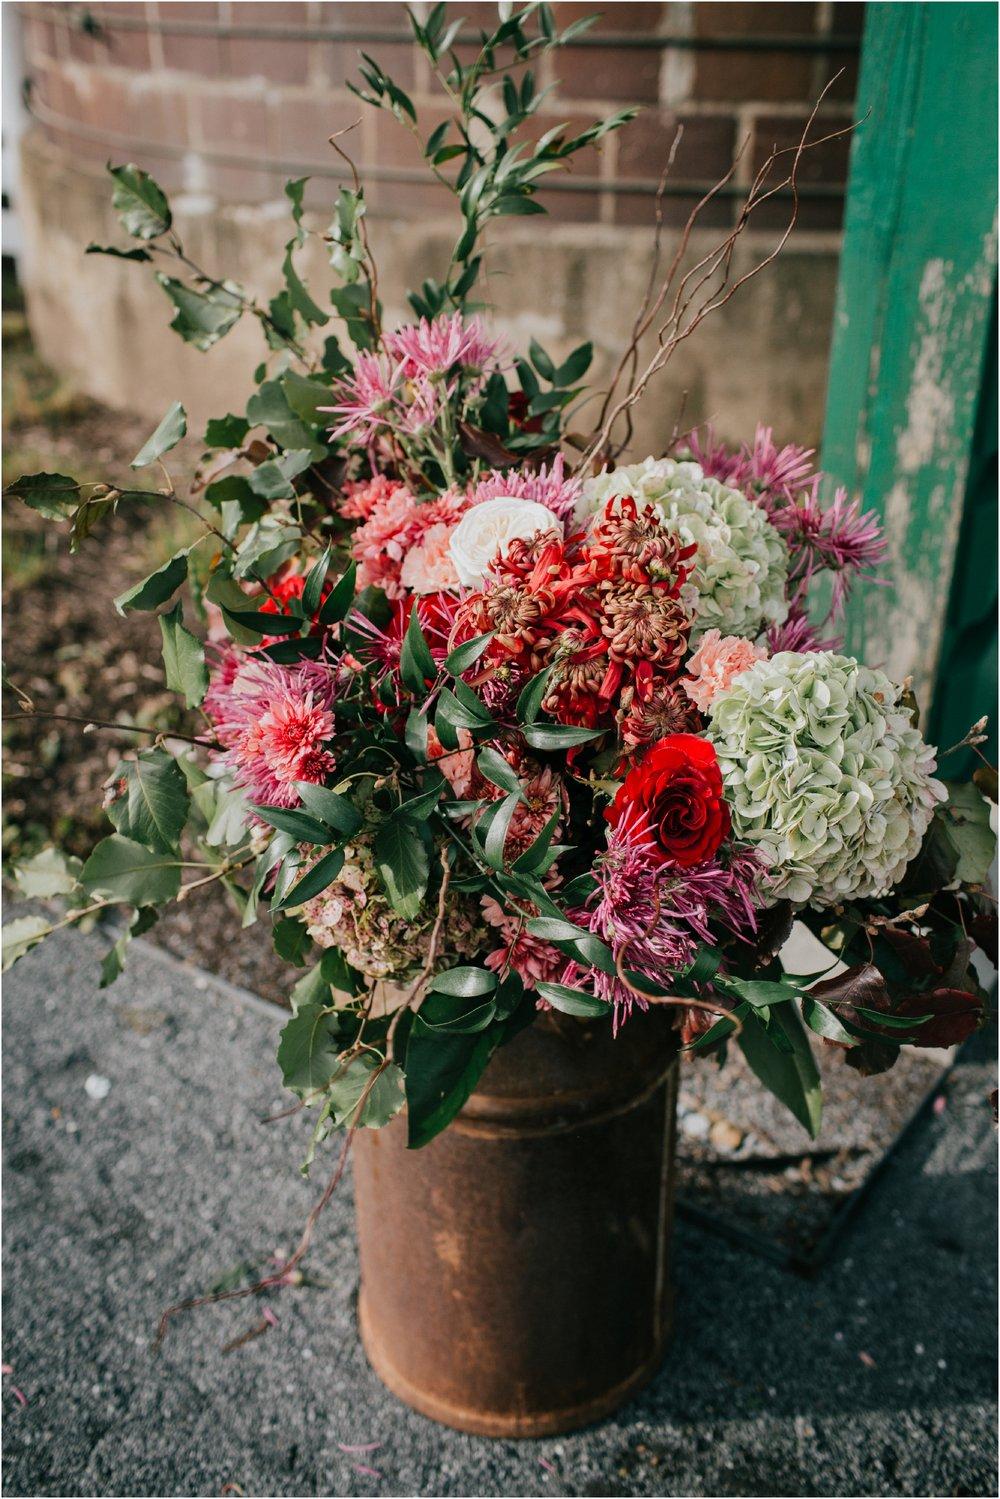 warm-springs-old-dairy-virginia-rustic-wedding-northeast-tennessee-elopement-adventuruous-photographer-katy-sergent_0076.jpg